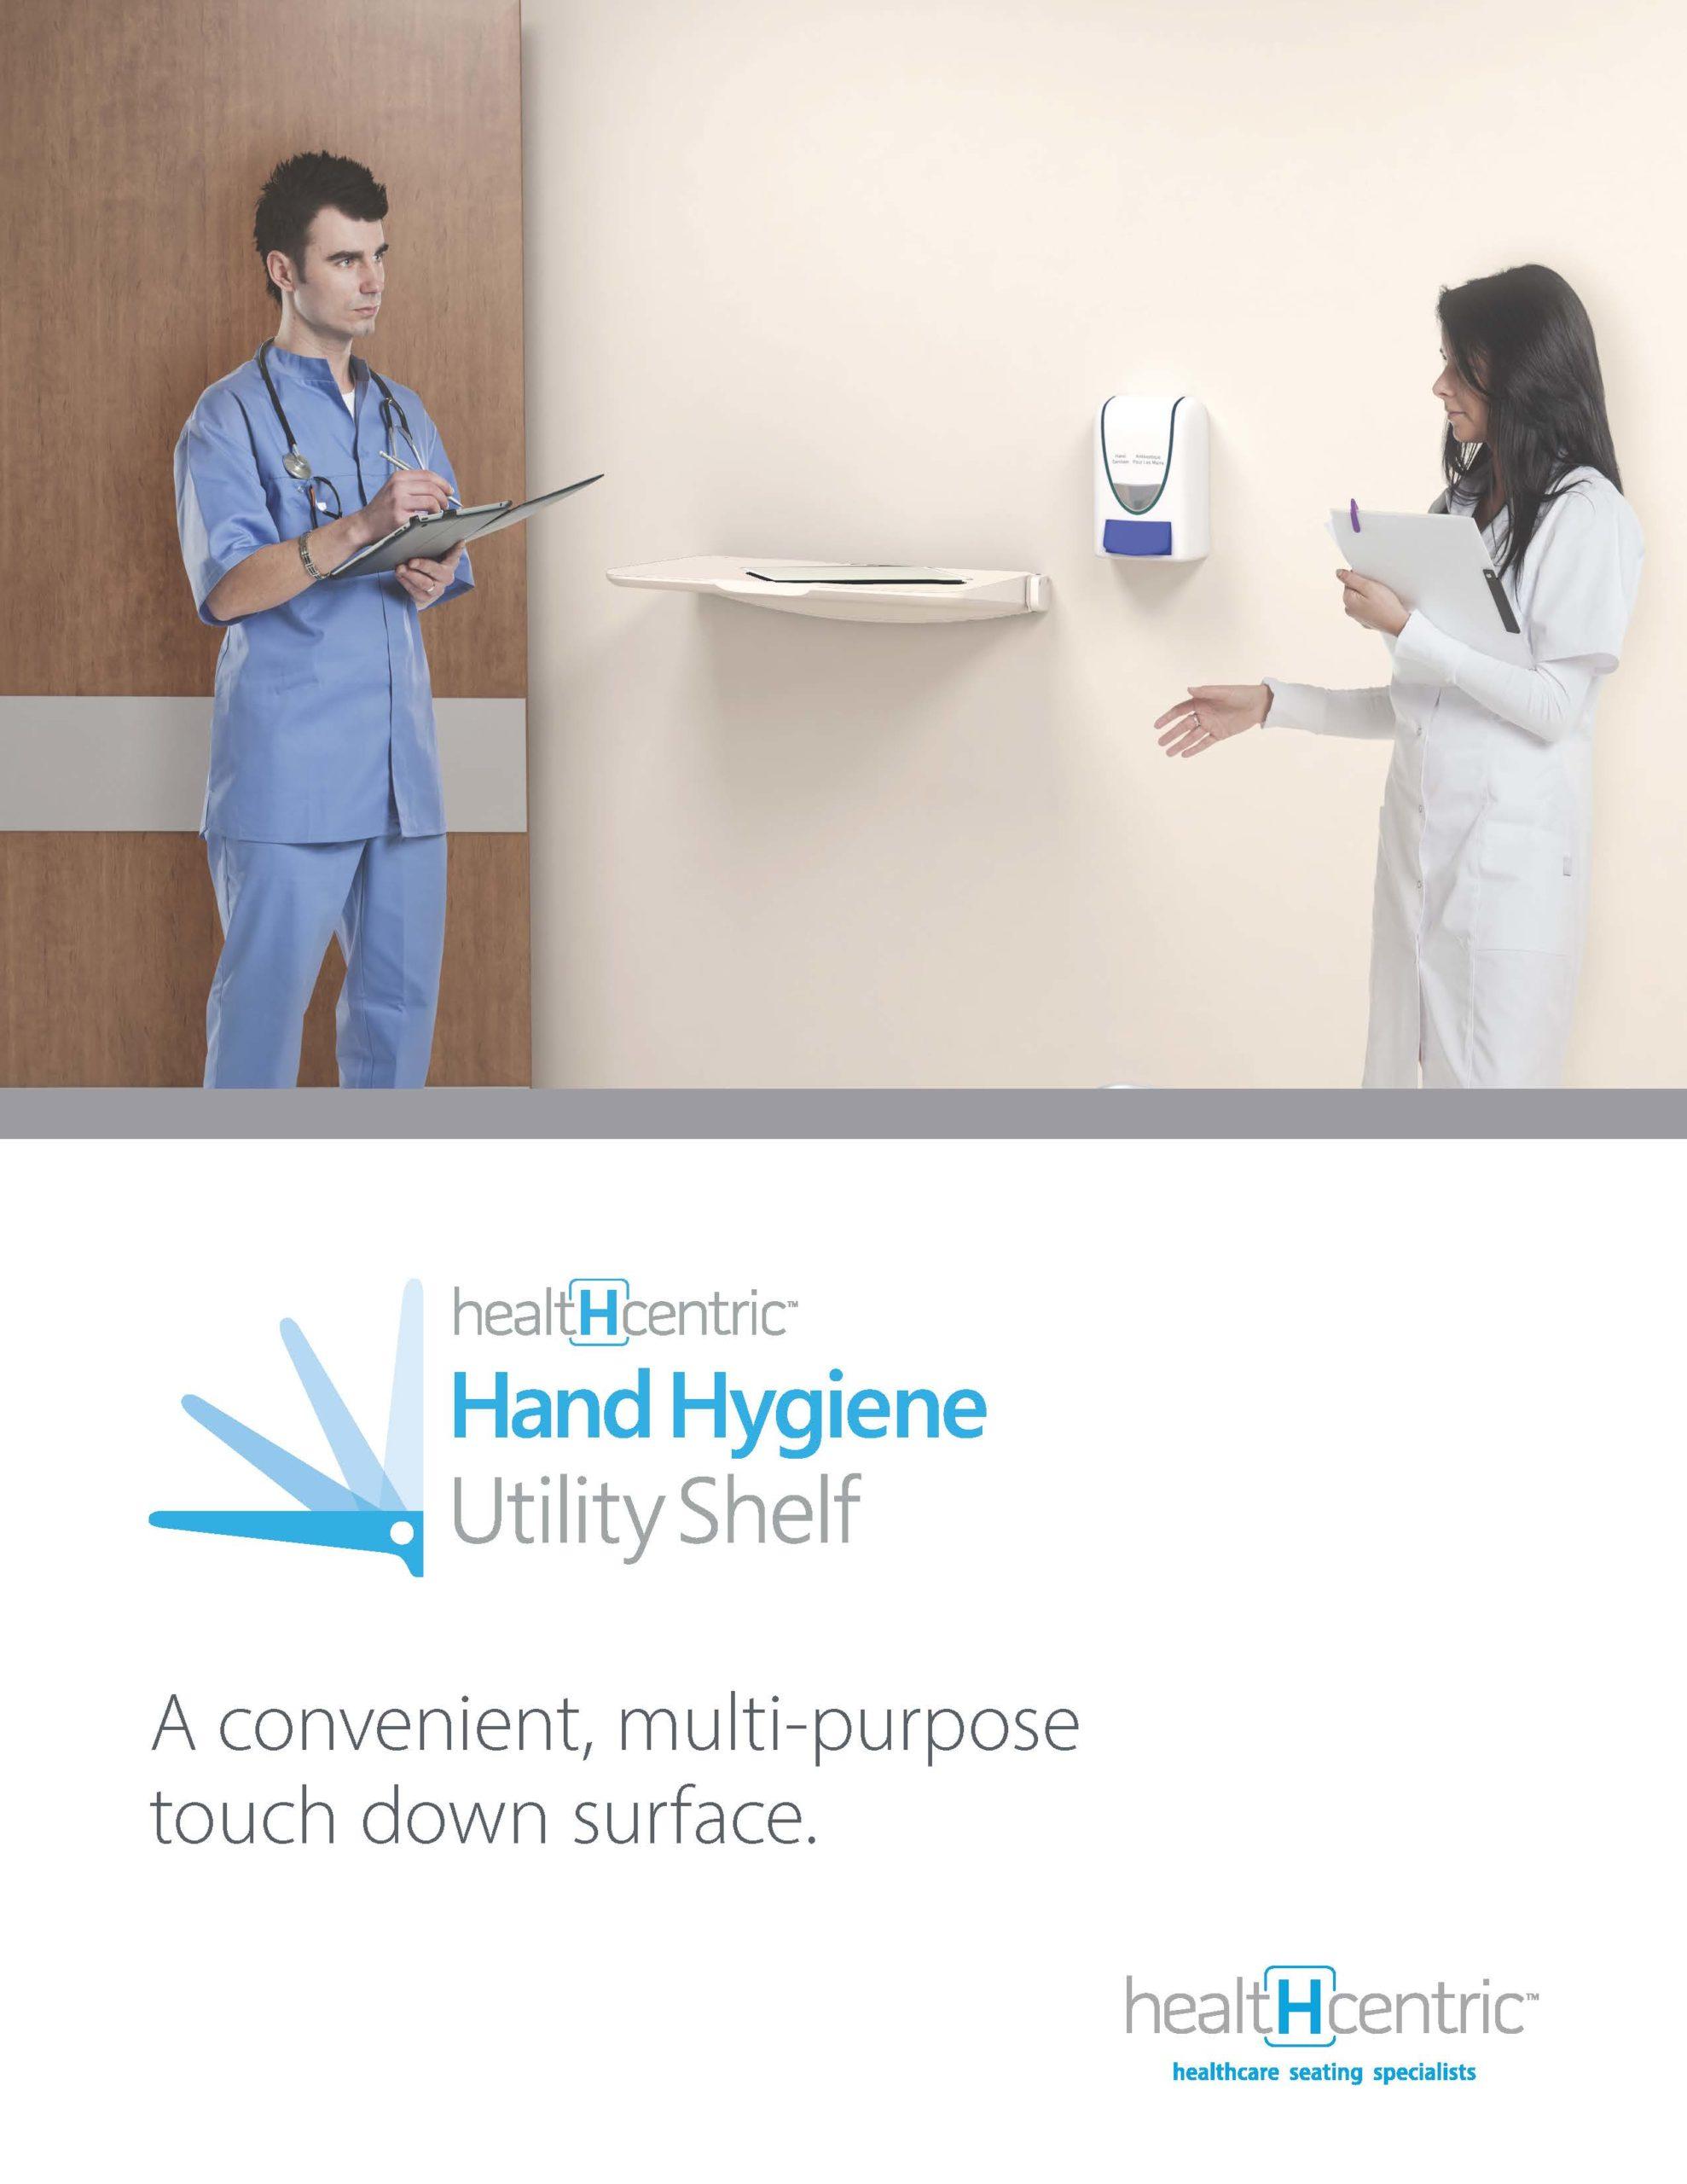 Hand Hygiene Utility Shelf